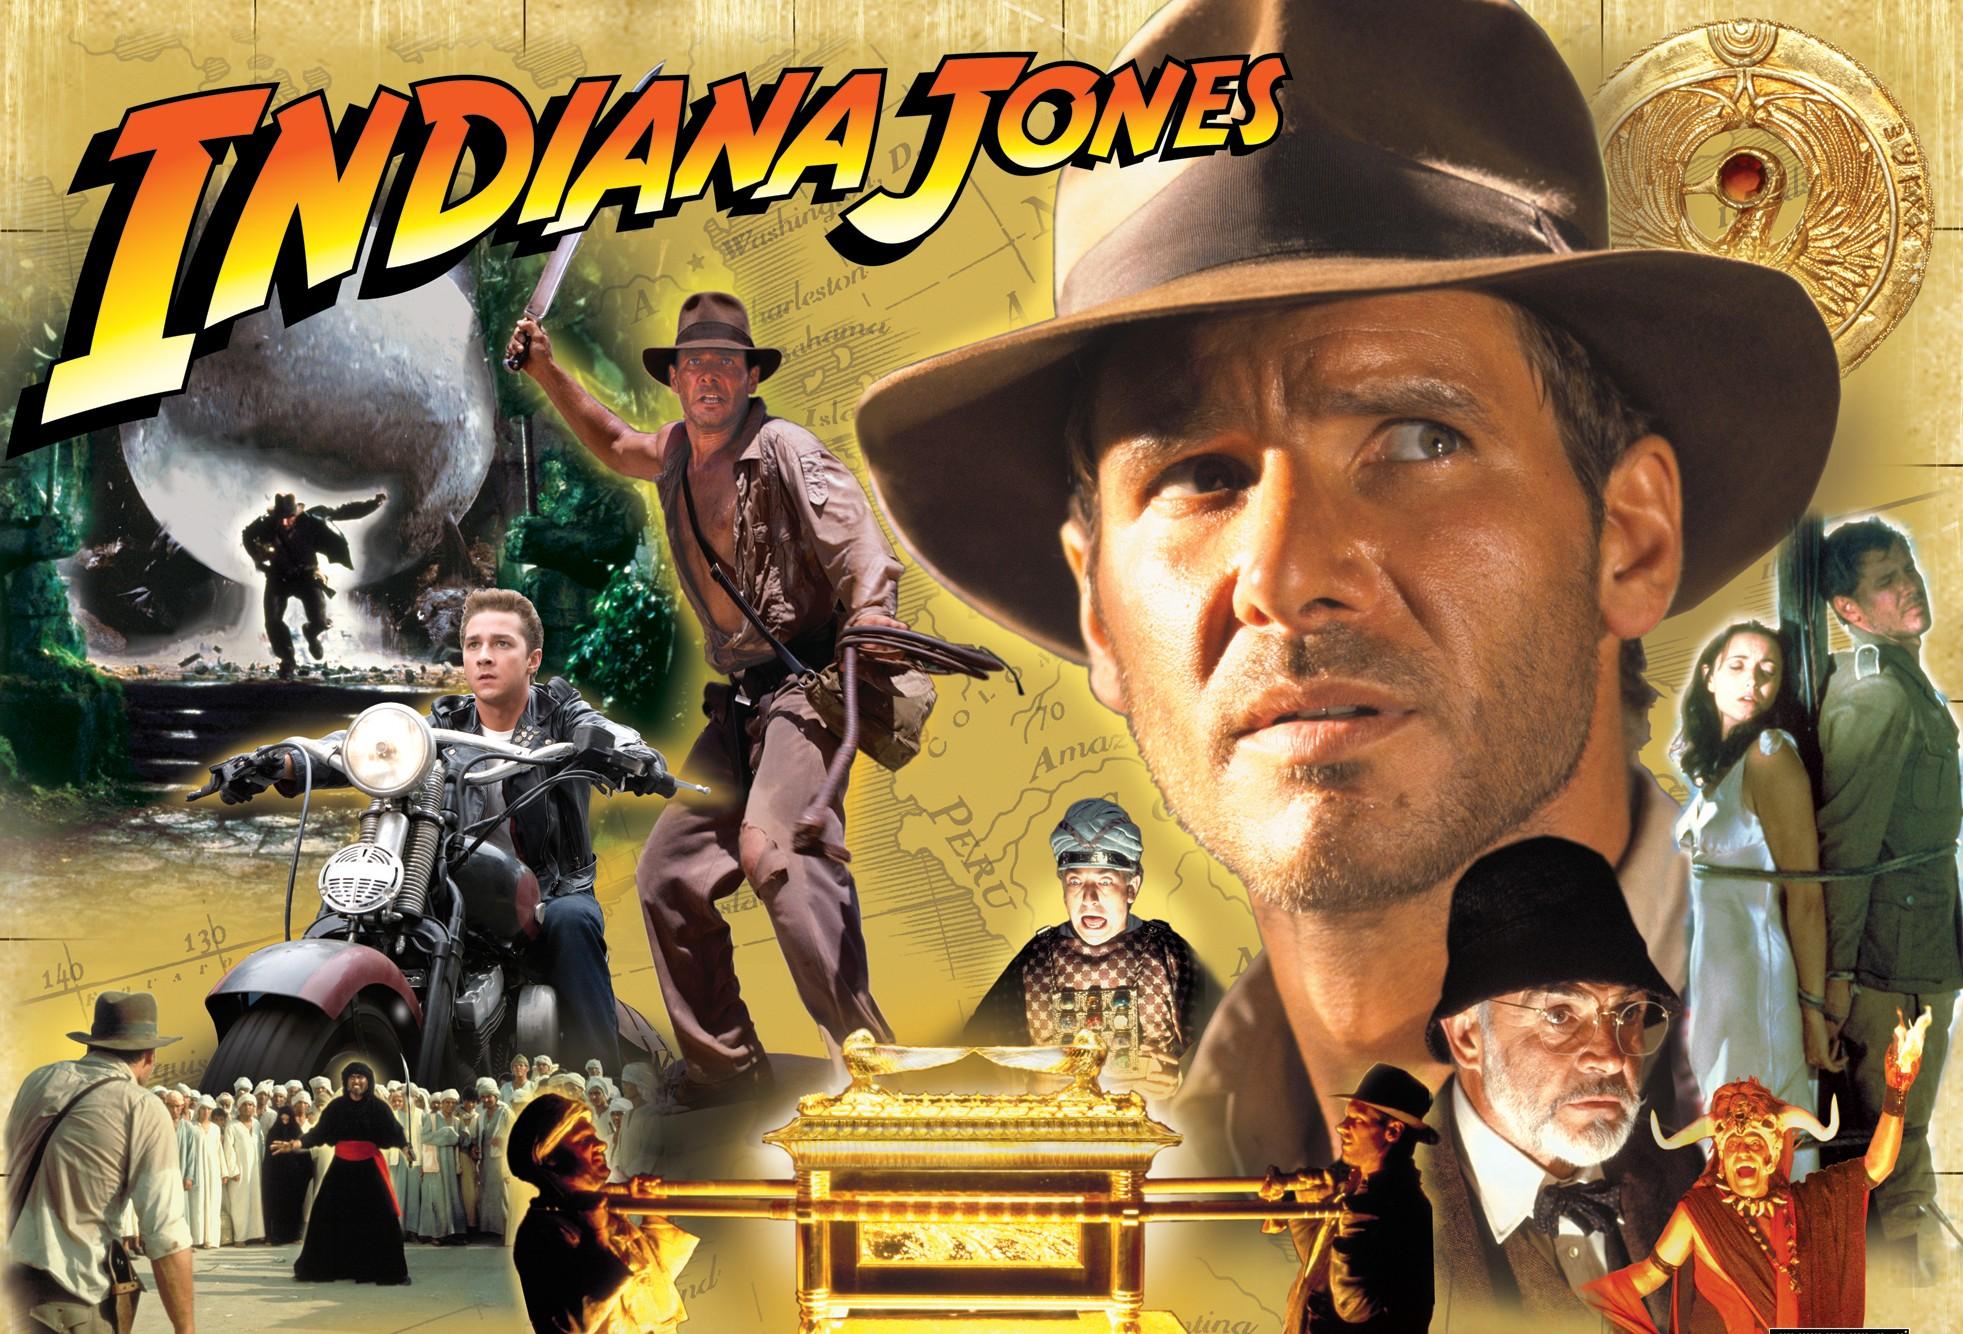 High Resolution Wallpaper   Indiana Jones 1963x1334 px